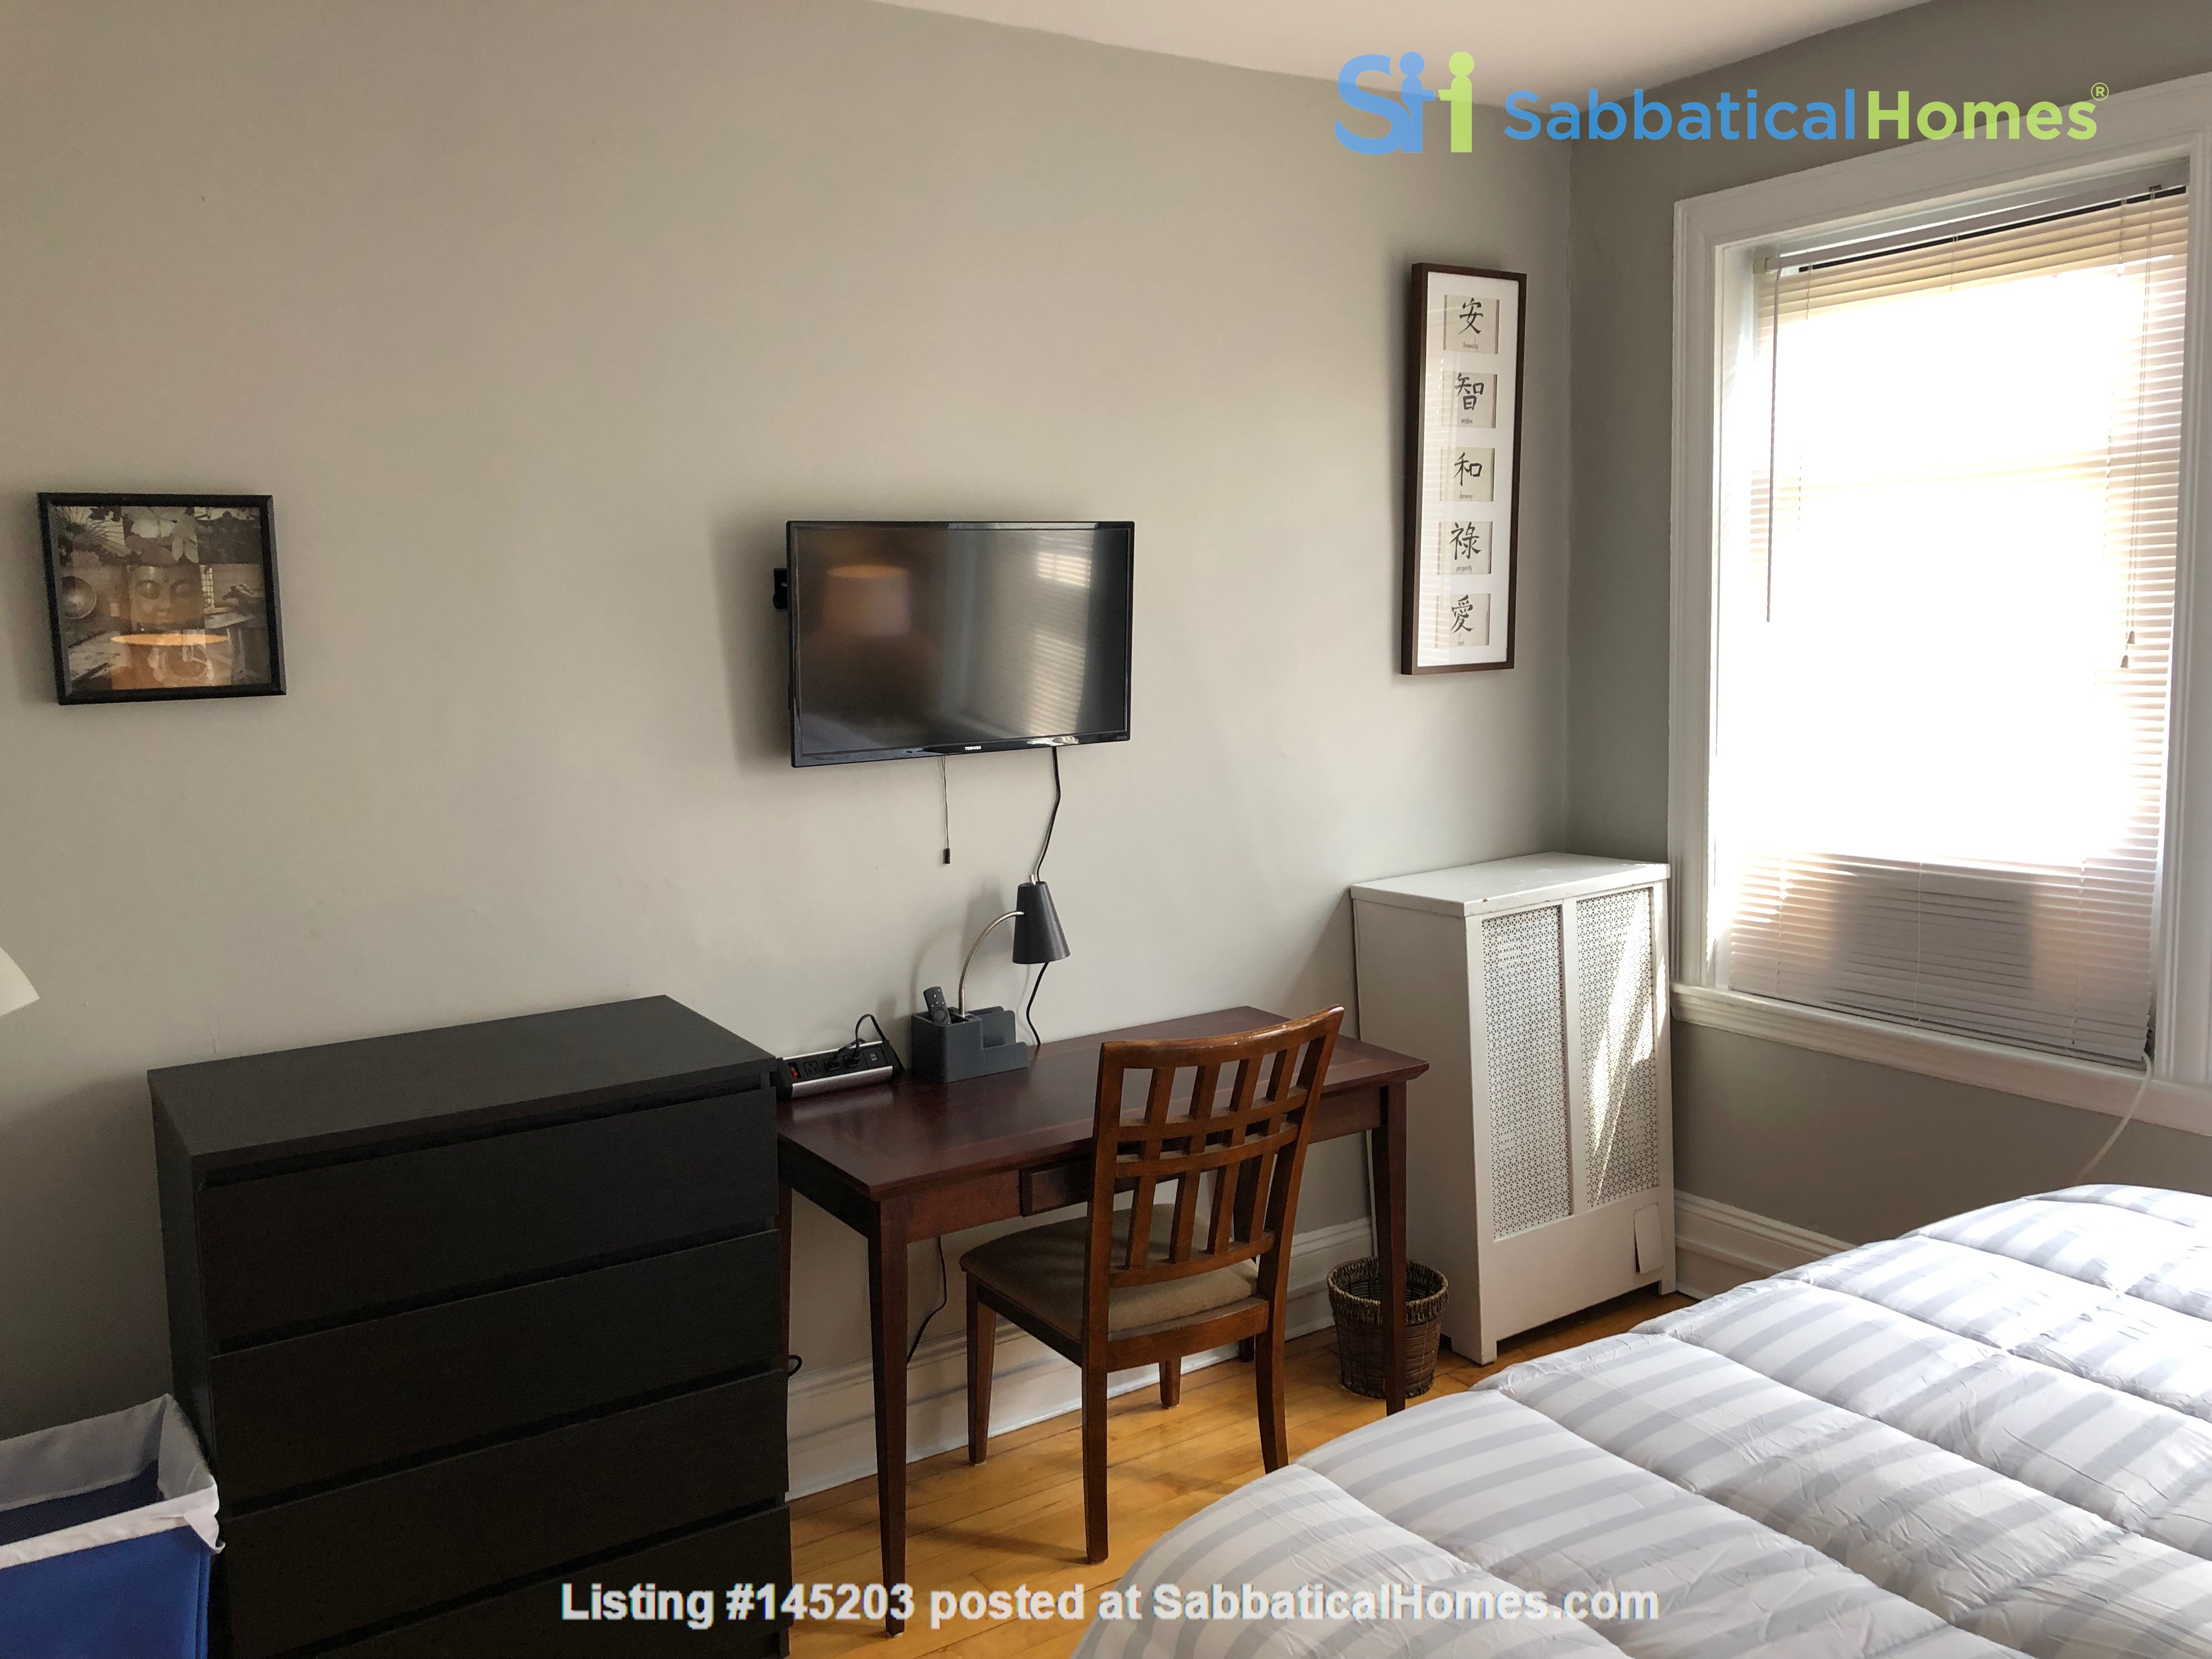 2bd/1ba Condo in Boston (Allston Neighborhood) near BU/BC/Harvard Home Rental in Boston, Massachusetts, United States 2